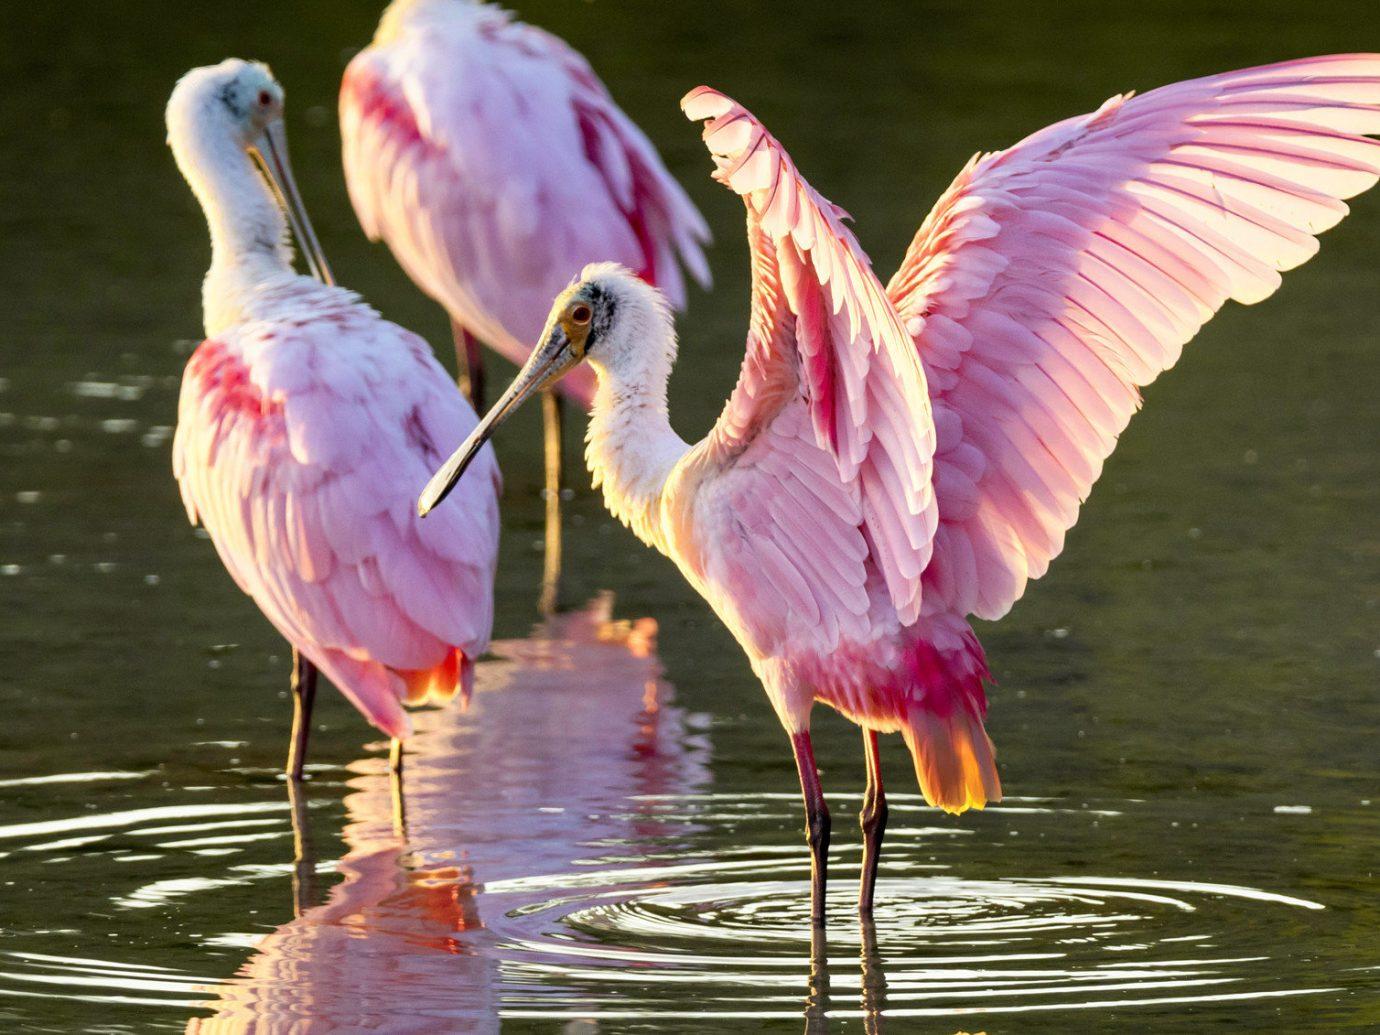 Hotels Secret Getaways Trip Ideas Bird water animal Nature beak vertebrate outdoor fauna flamingo spoonbill Wildlife water bird aquatic bird reflection wing flower colored